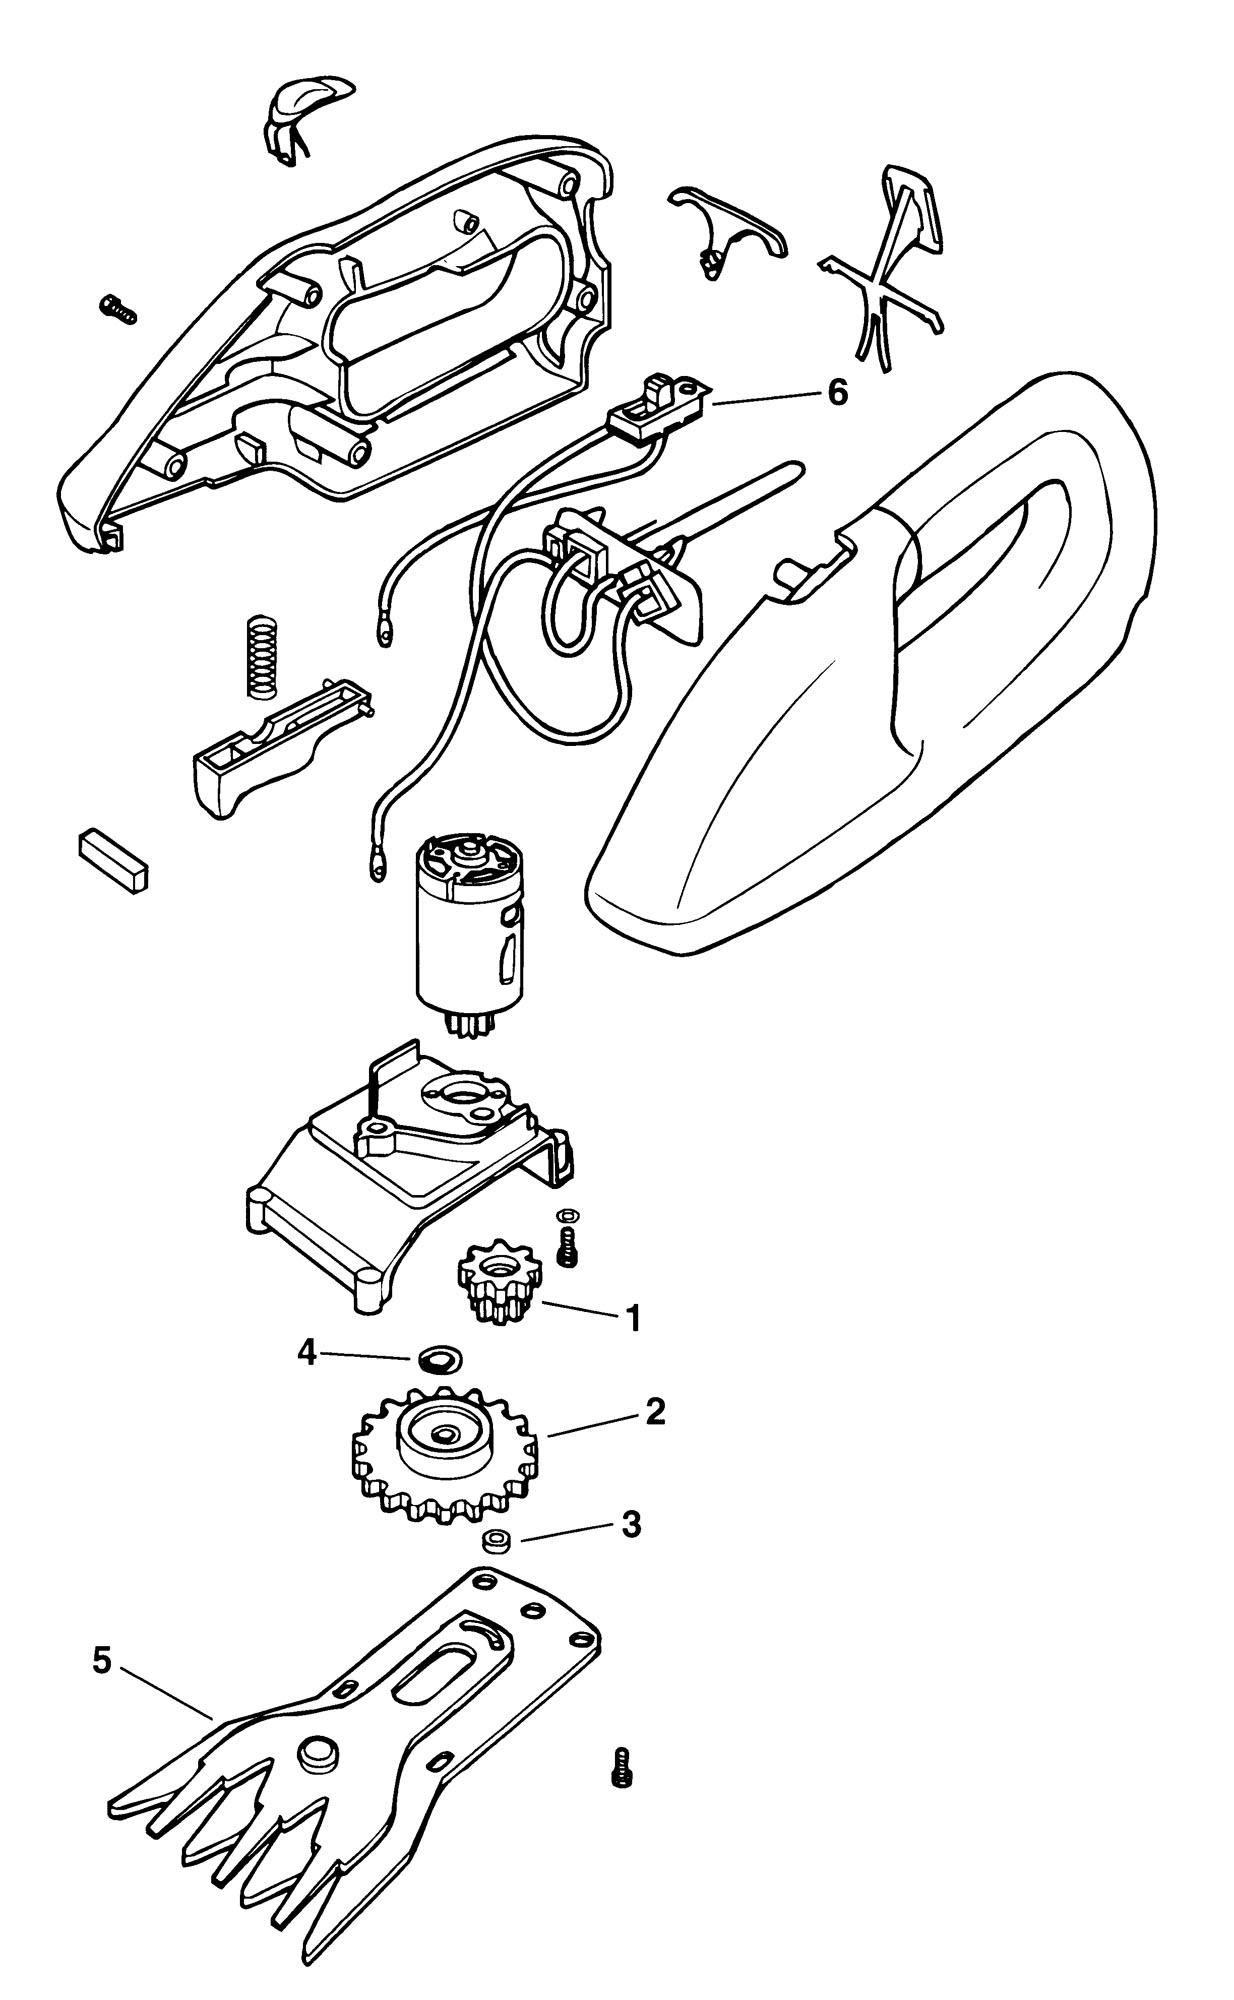 Bush Hog Parts Lookup Schematics Brush Diagram Explained Wiring Diagrams 1234x2000